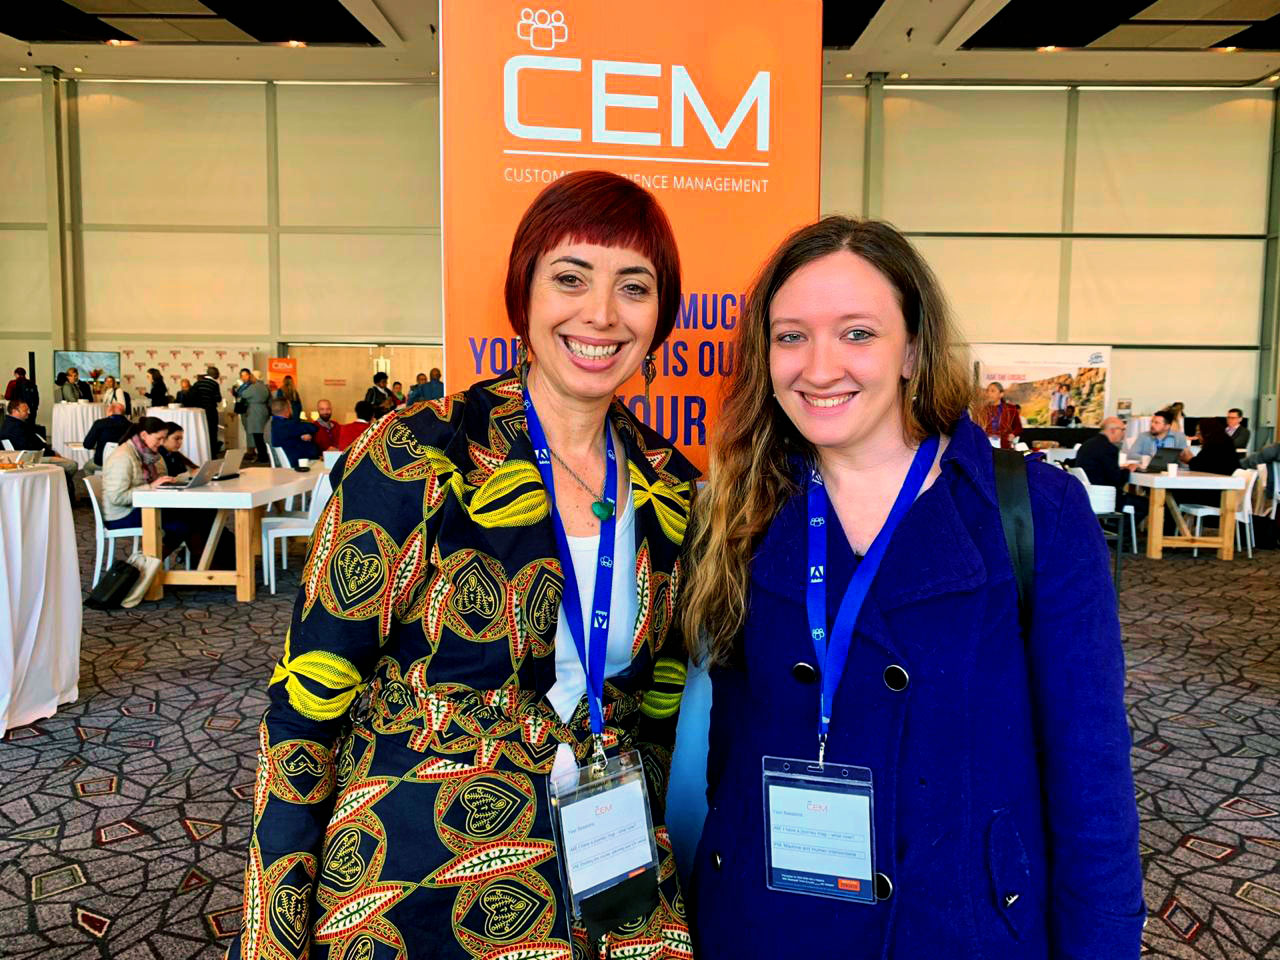 Always big smiles when I run into Chantel Botha of BrandLove at the CEM Africa Summit!